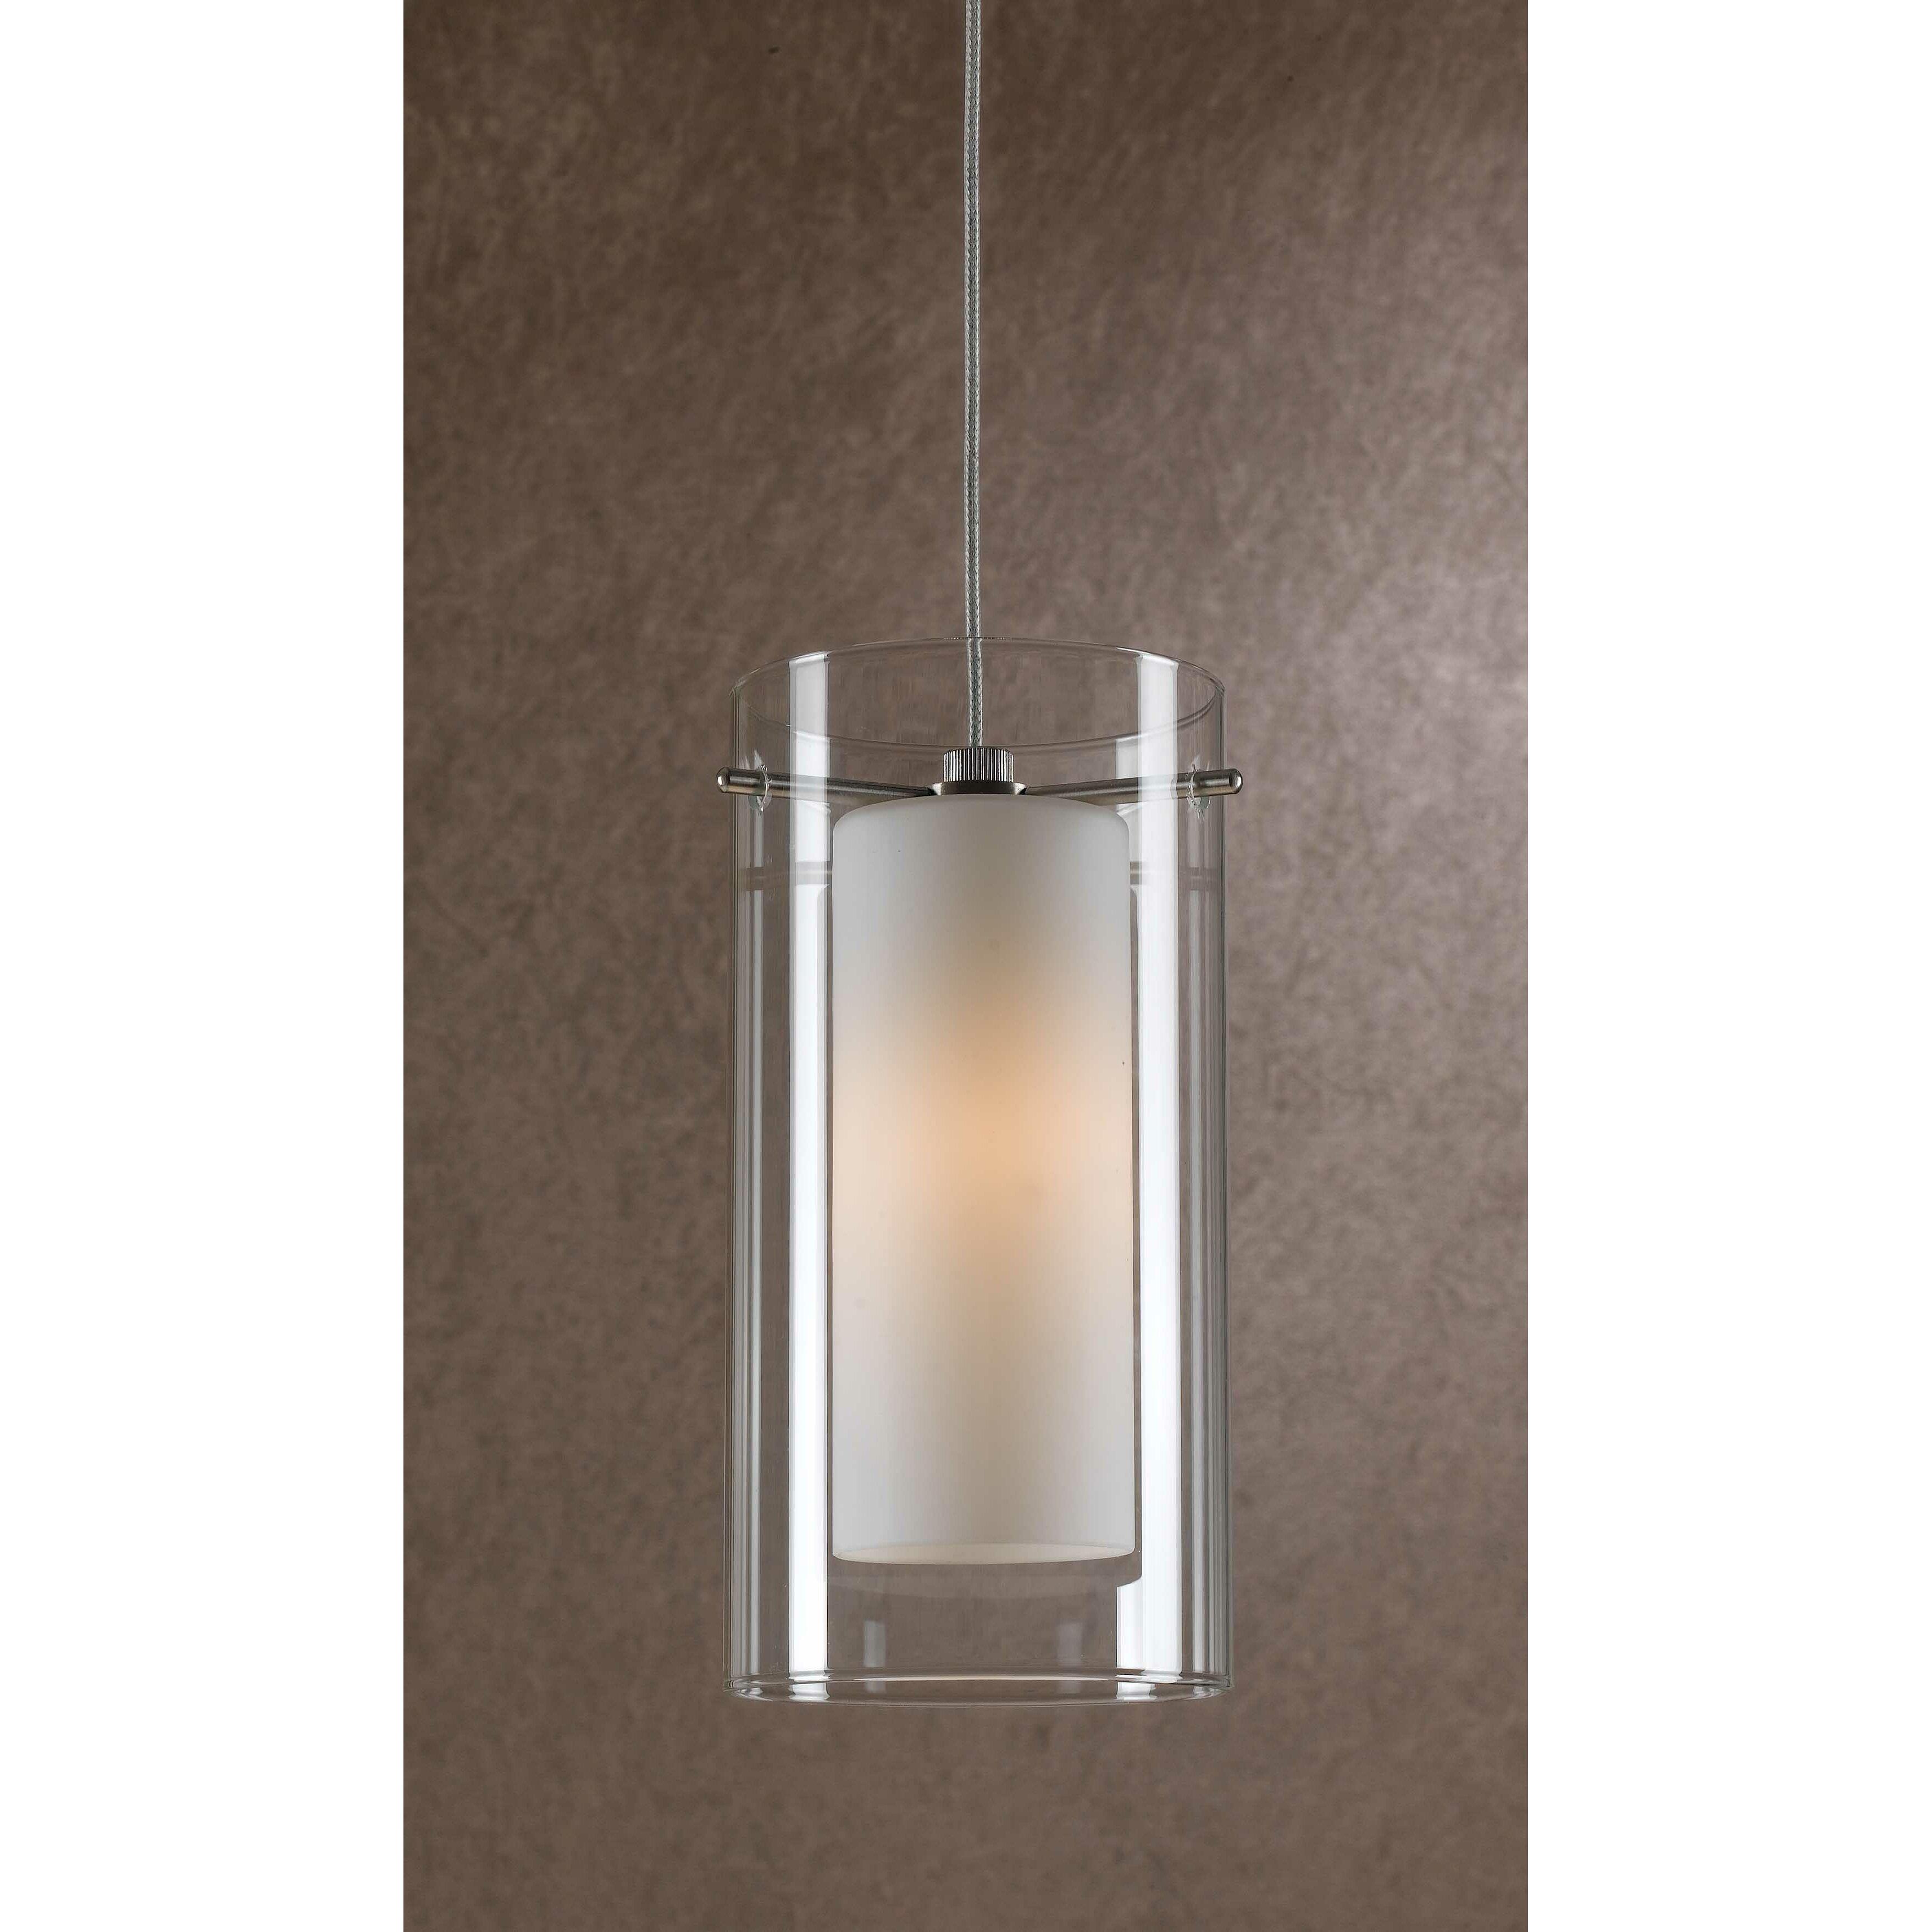 Low Voltage Bathroom Lighting: Cal Lighting Low Voltage Pendant & Reviews